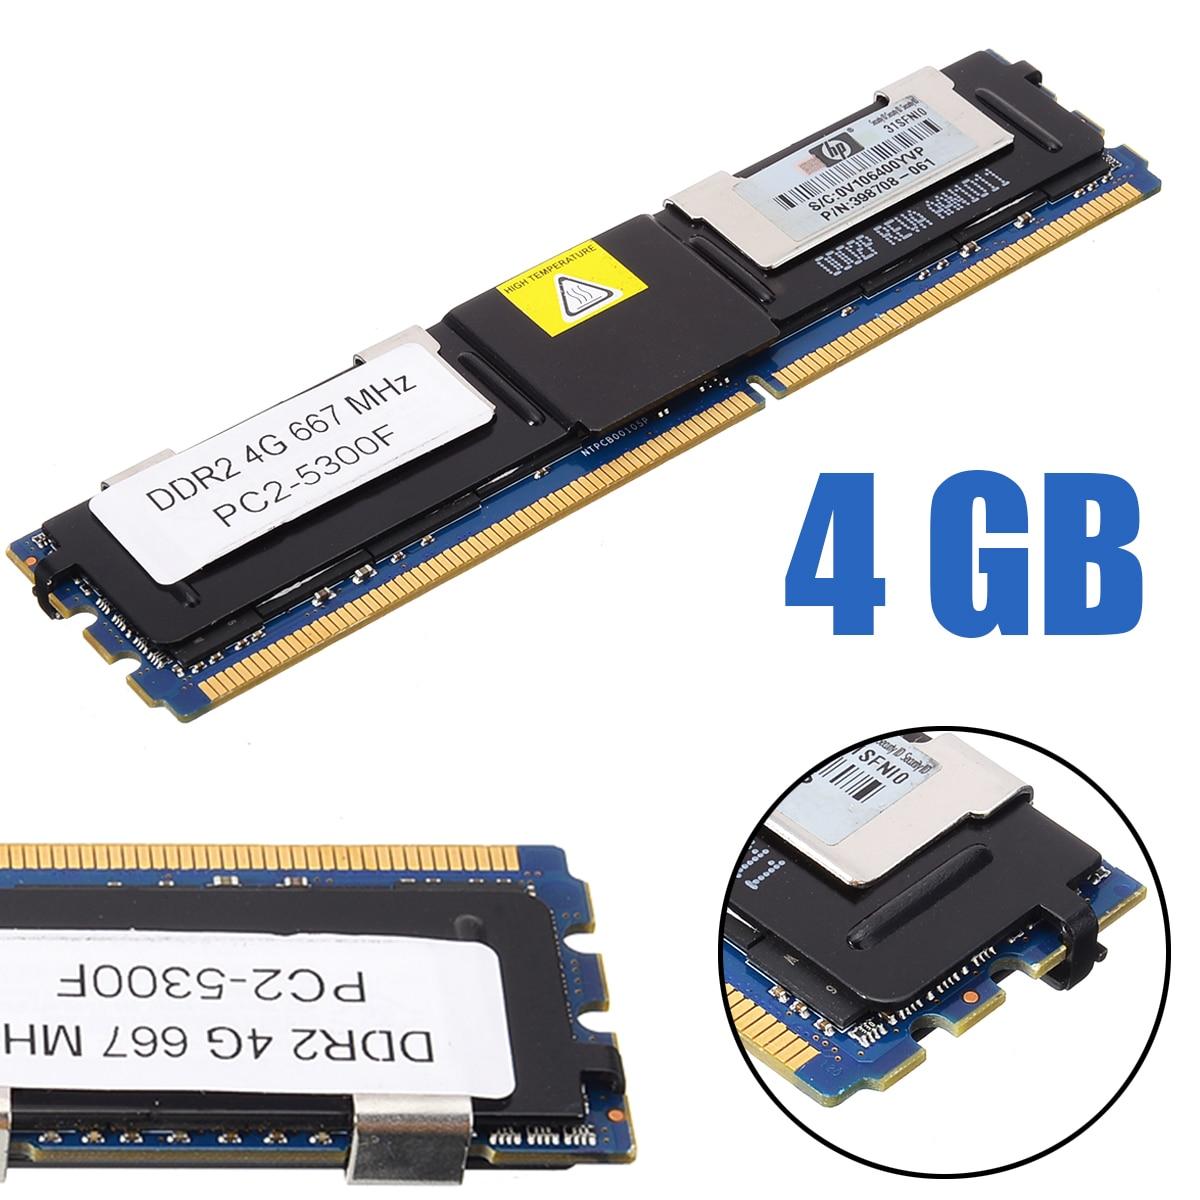 For PC Memory RAM Memoria Module Computer Desktop Ram DDR2 4GB 5300F 667Mhz 1.8V ECC 240 Pin CL5 Memory Ram Pohiks